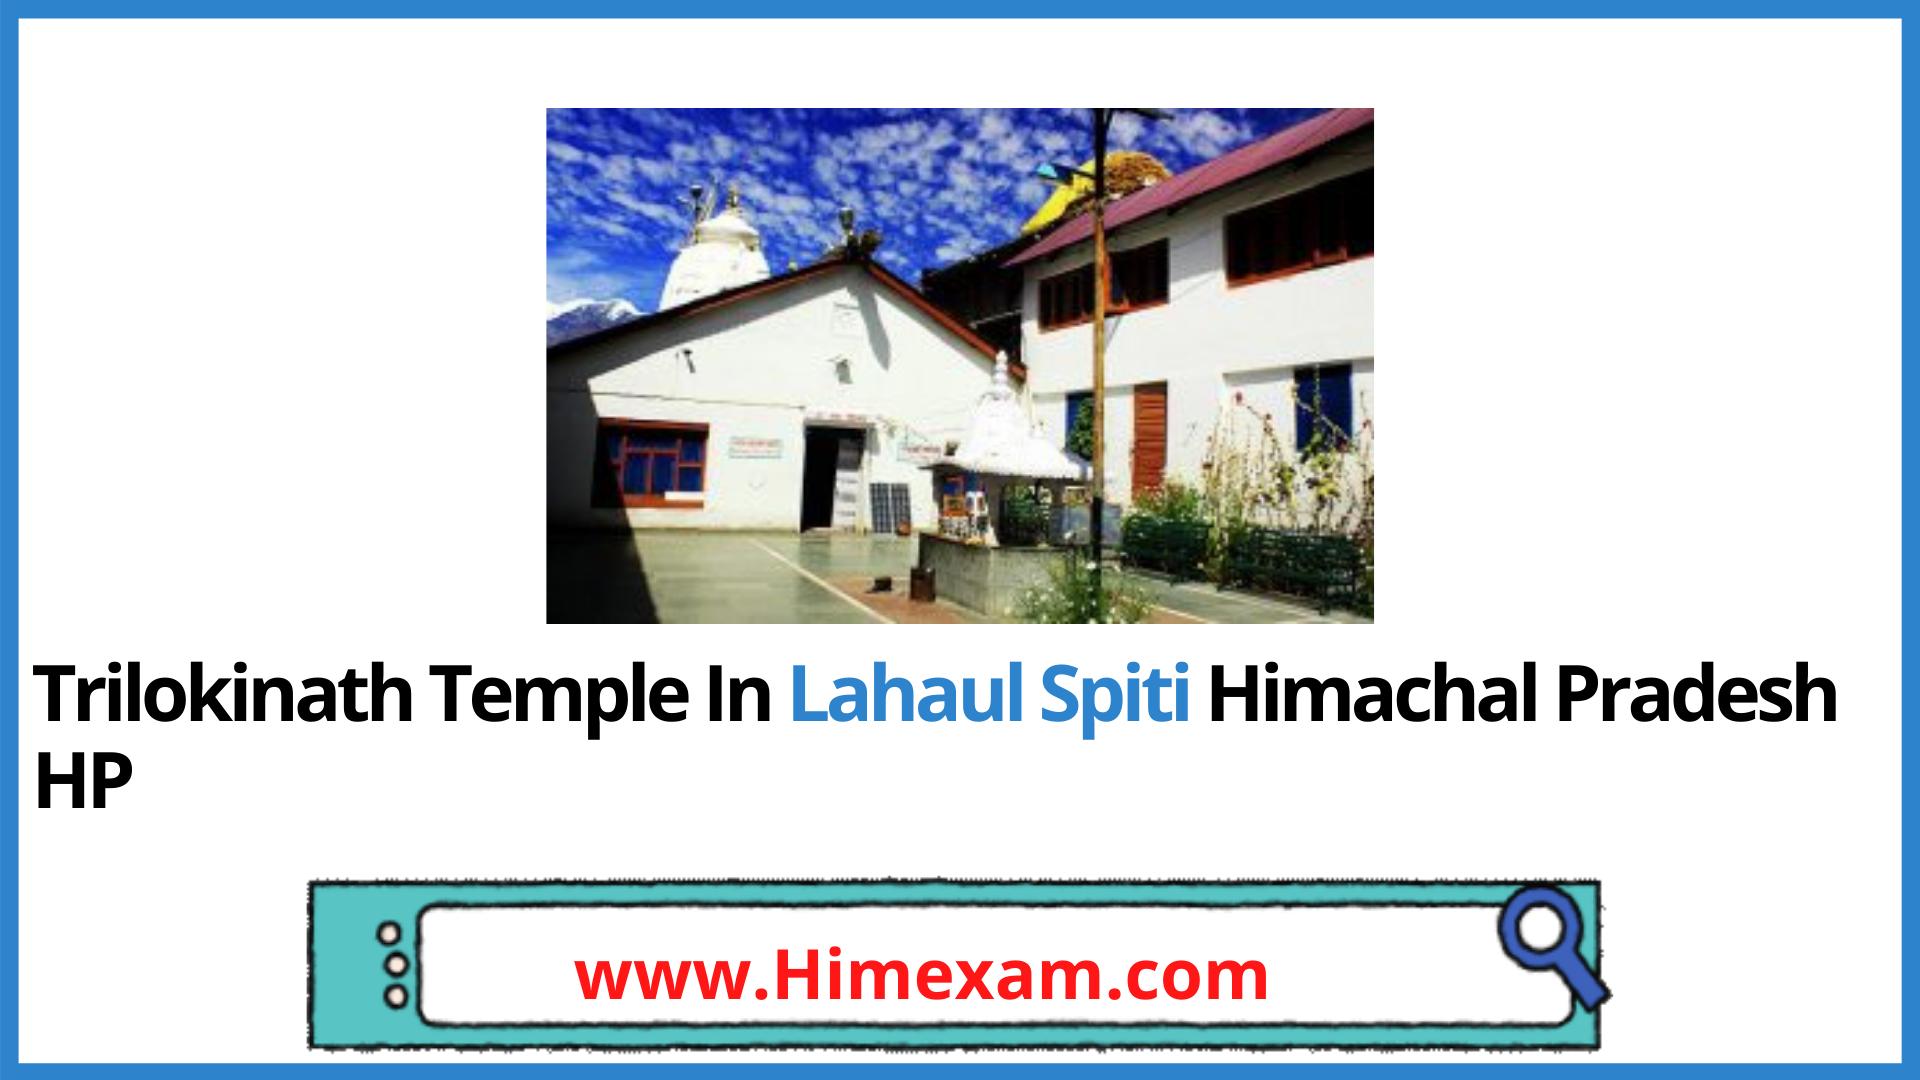 Trilokinath Temple In Lahaul Spiti Himachal Pradesh HP